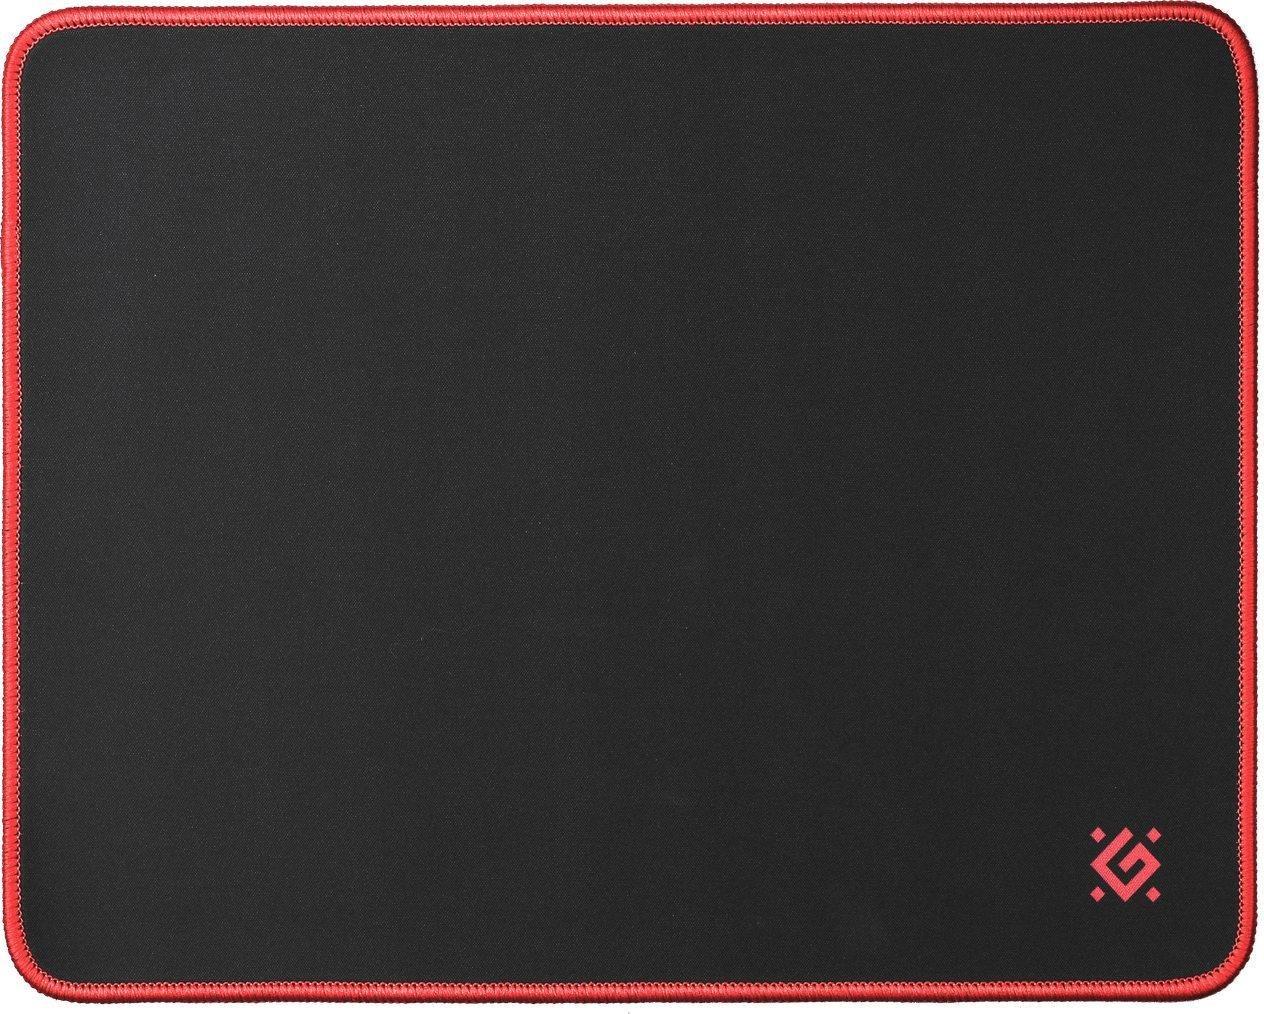 Defender Podkładka Gaming M Czarna 360x270x3mm